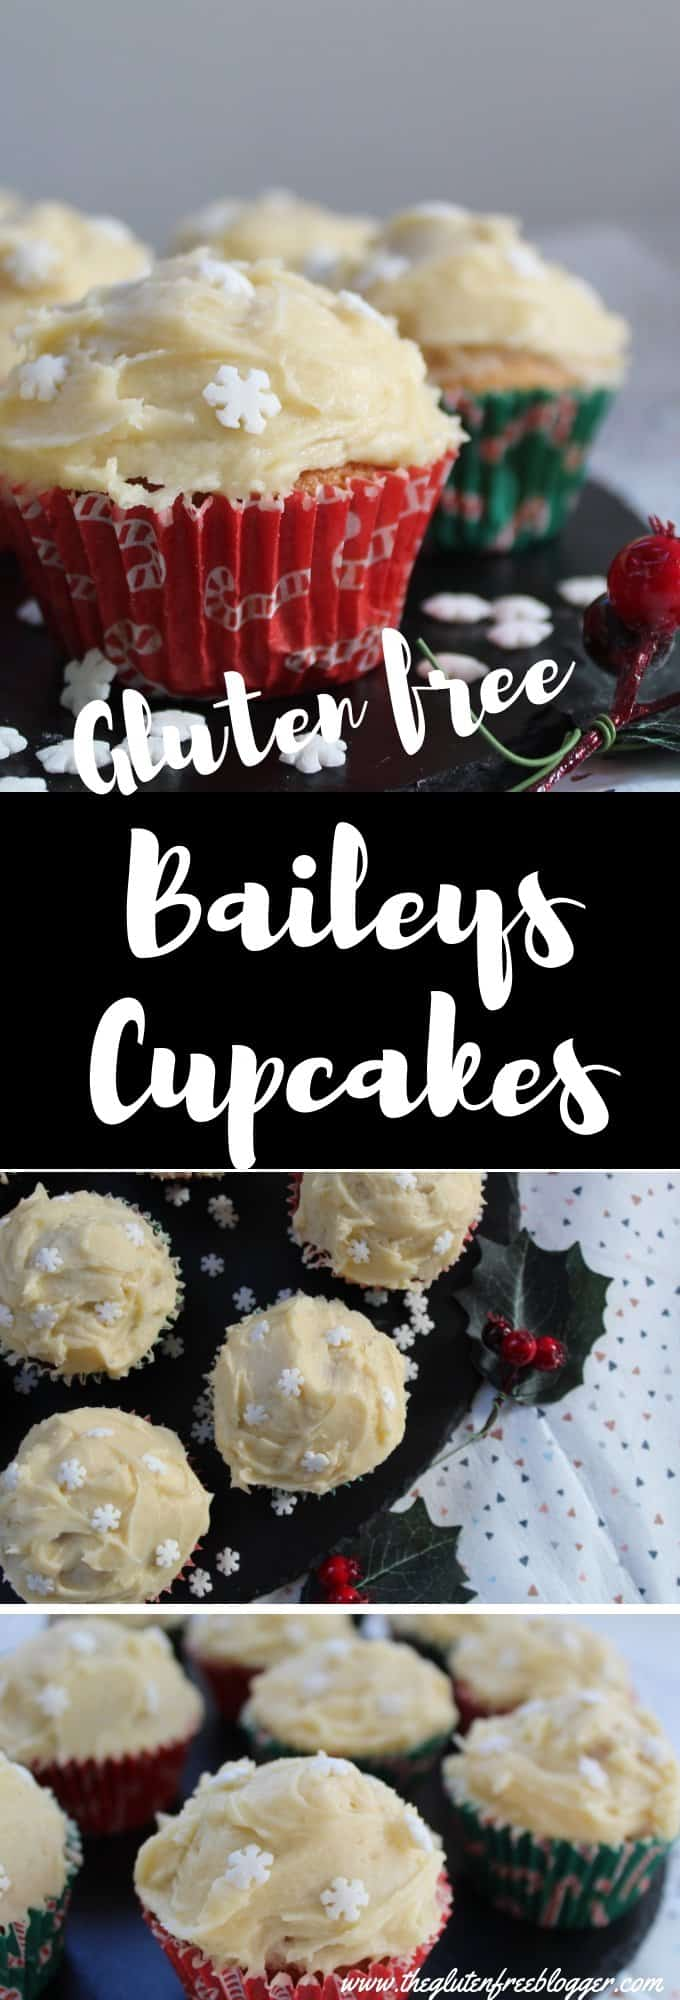 gluten free baileys cupcakes - irish cream cupcakes - baileys frosting - gluten free cake recipe- gluten free christmas